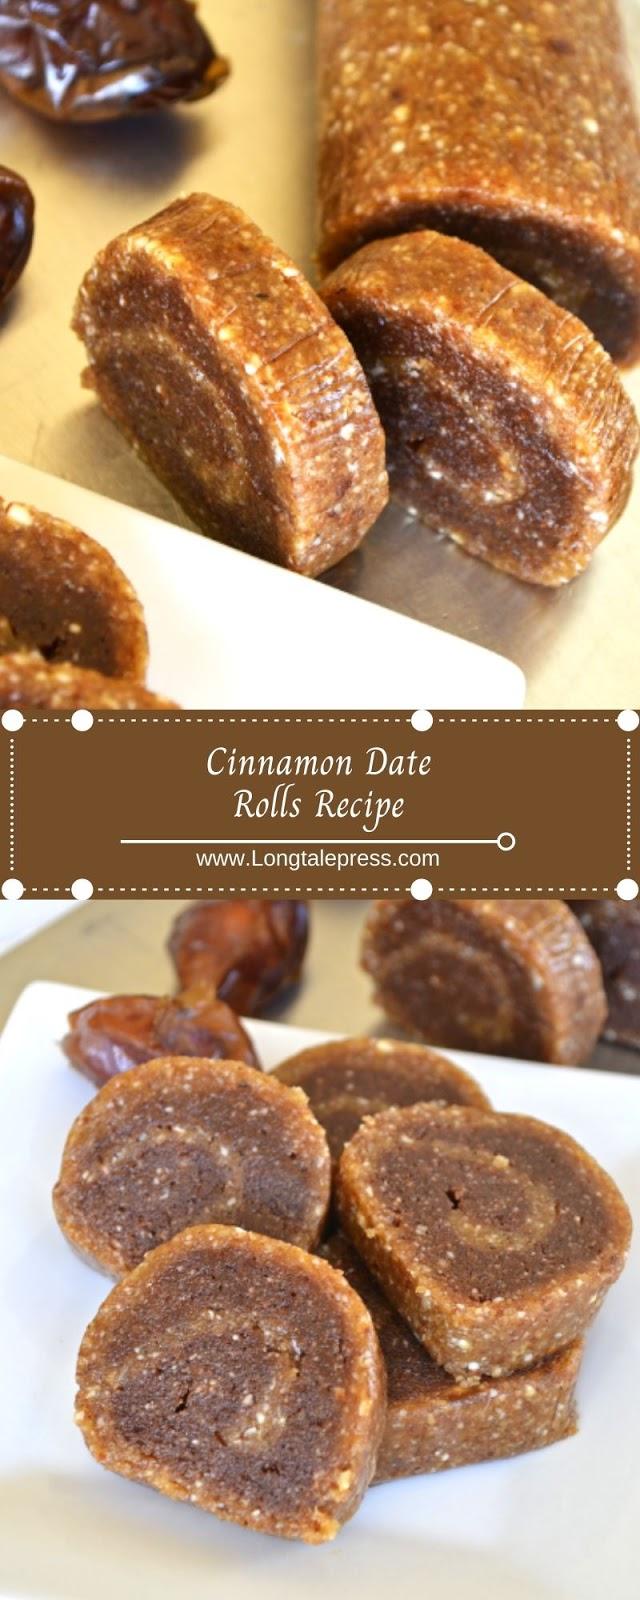 Cinnamon Date Rolls Recipe